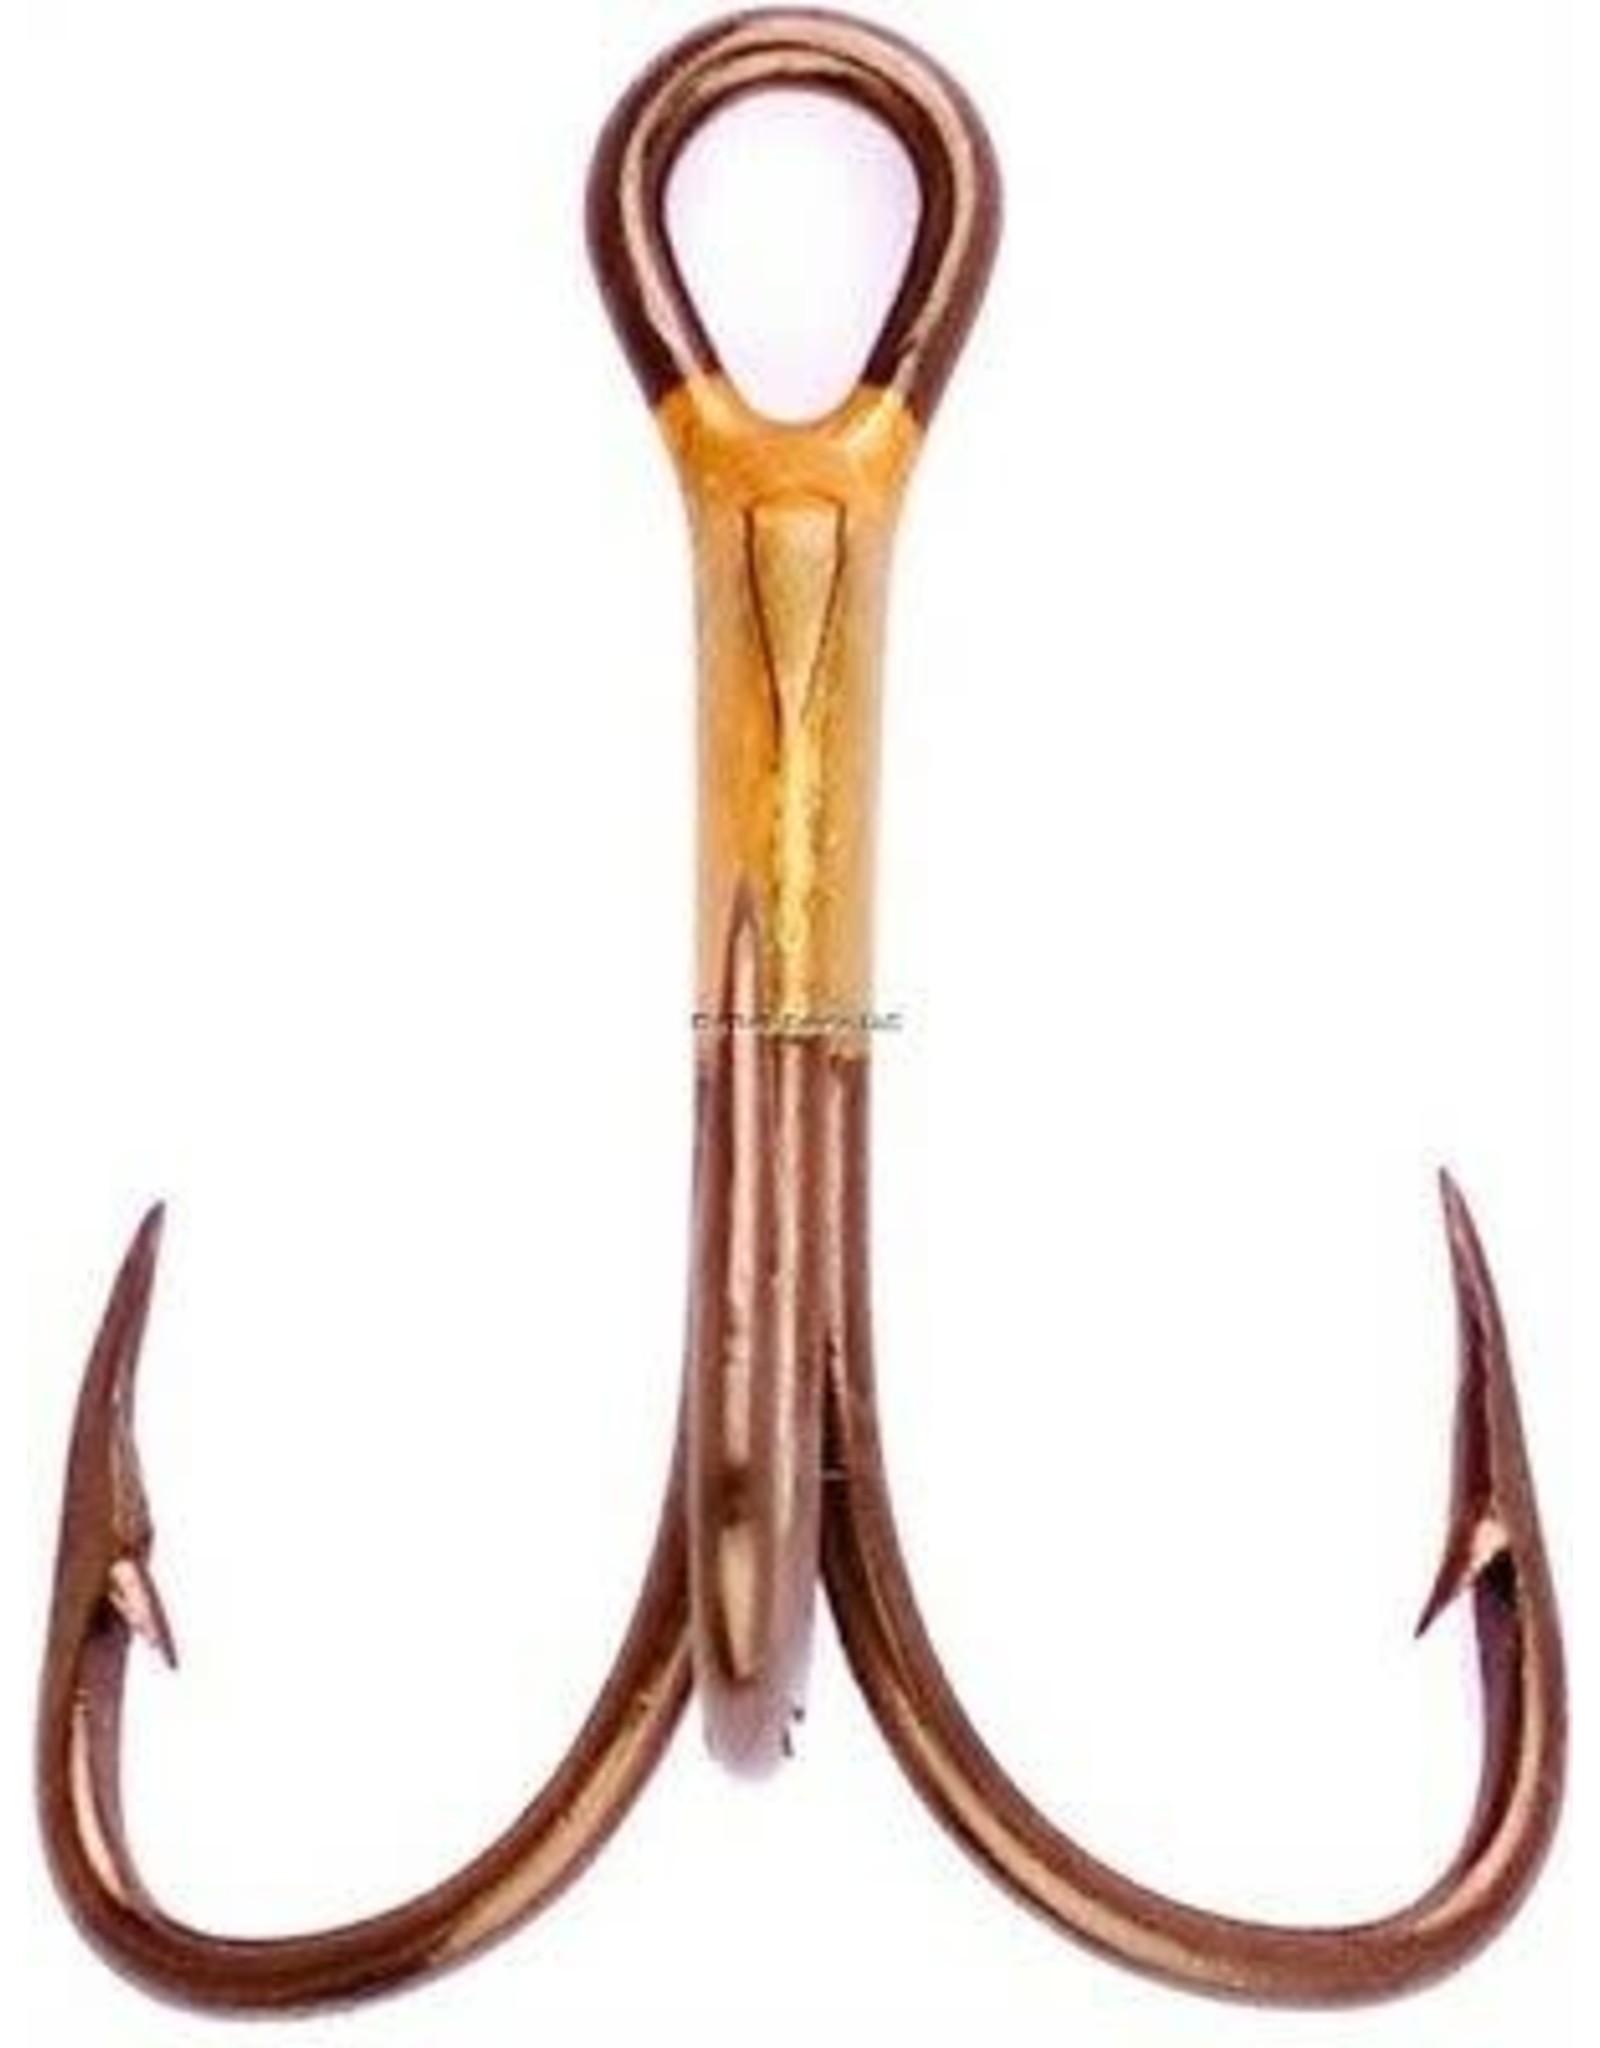 Eagle Claw Eagle Claw Classic Treble Size 14 - 5 Count